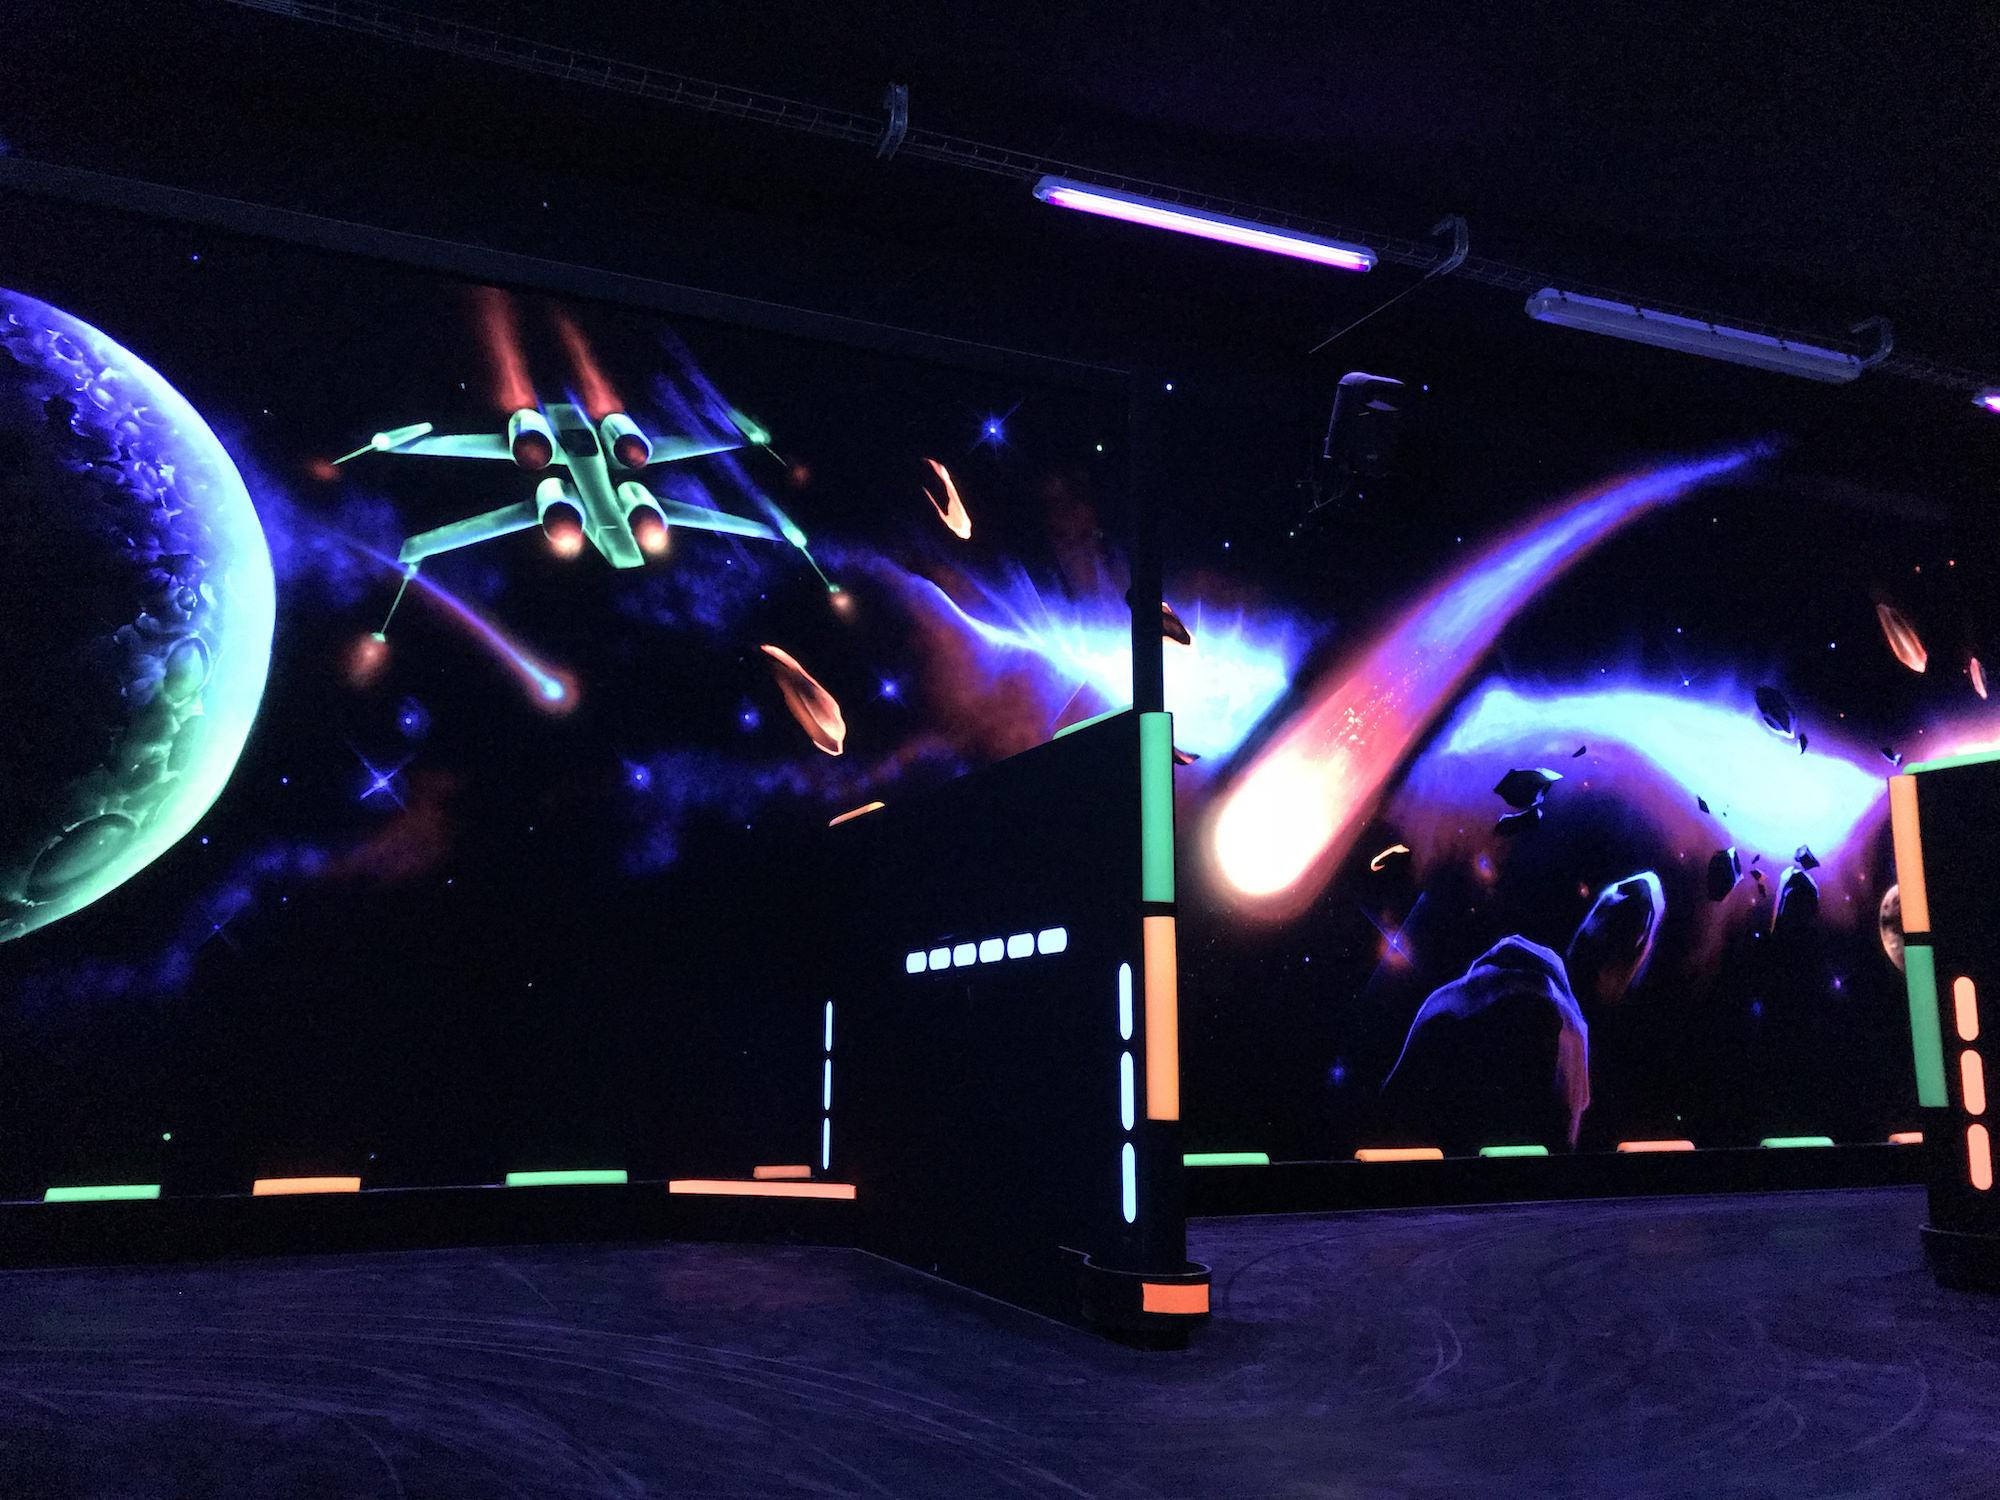 06-fresque-graffiti-blacklight-lumiere-ultraviolet